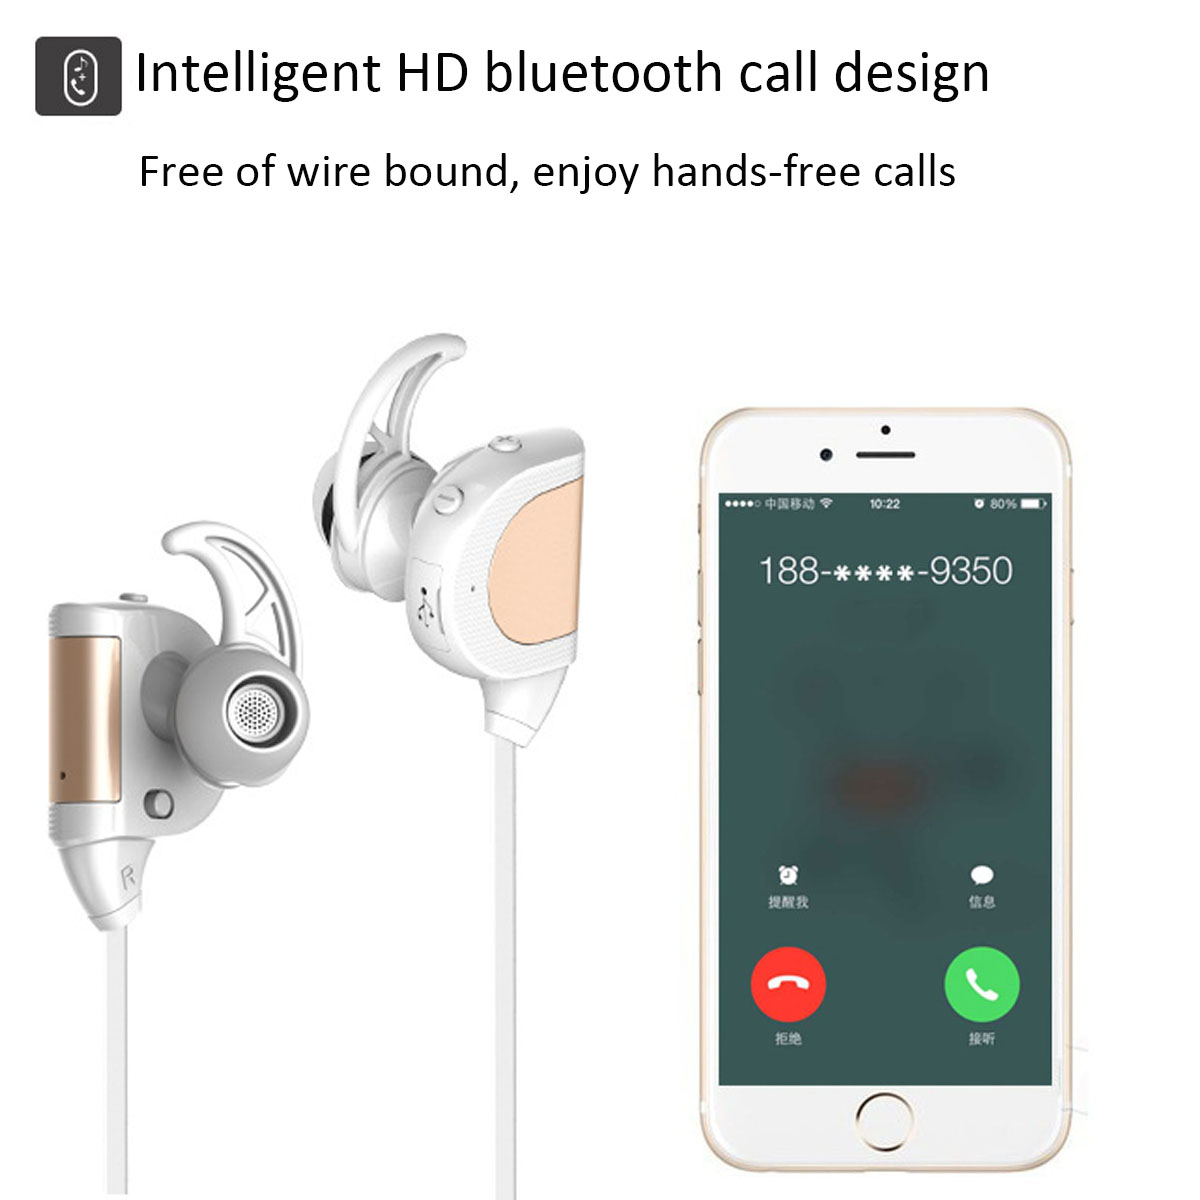 ... Auriculares Inalámbrico Bluetooth 4.1 Estéreo mobet william hill kostenlos williamhill Manos Libre Para